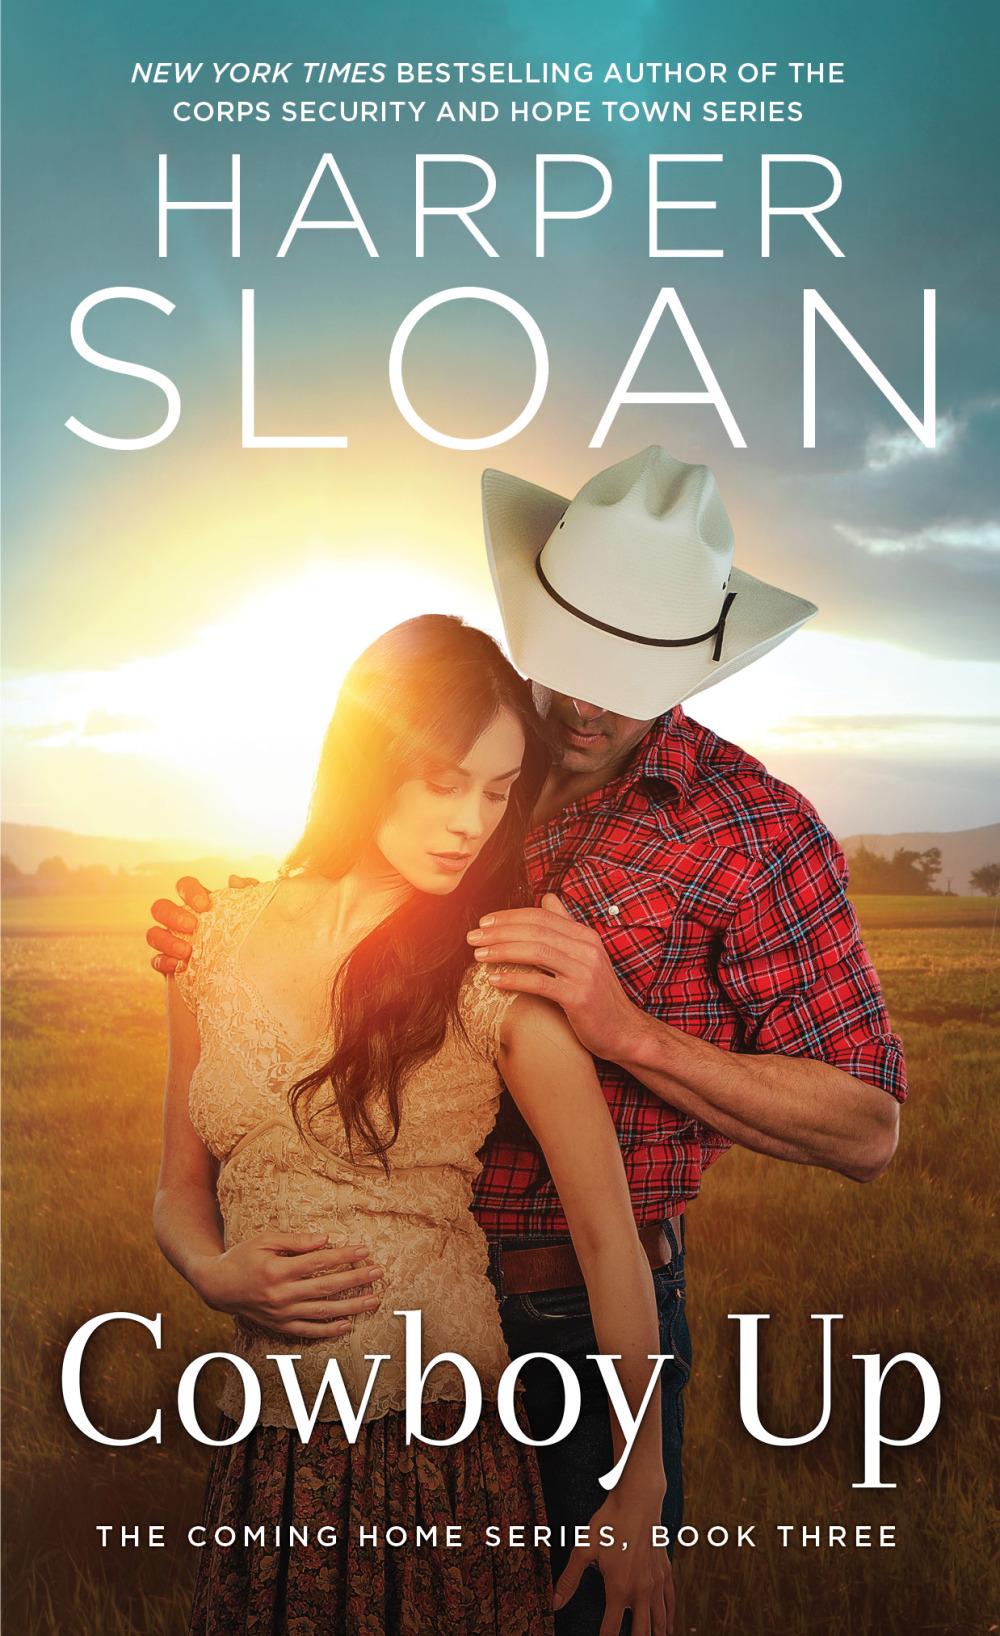 Cowboy Up by Harper Sloan